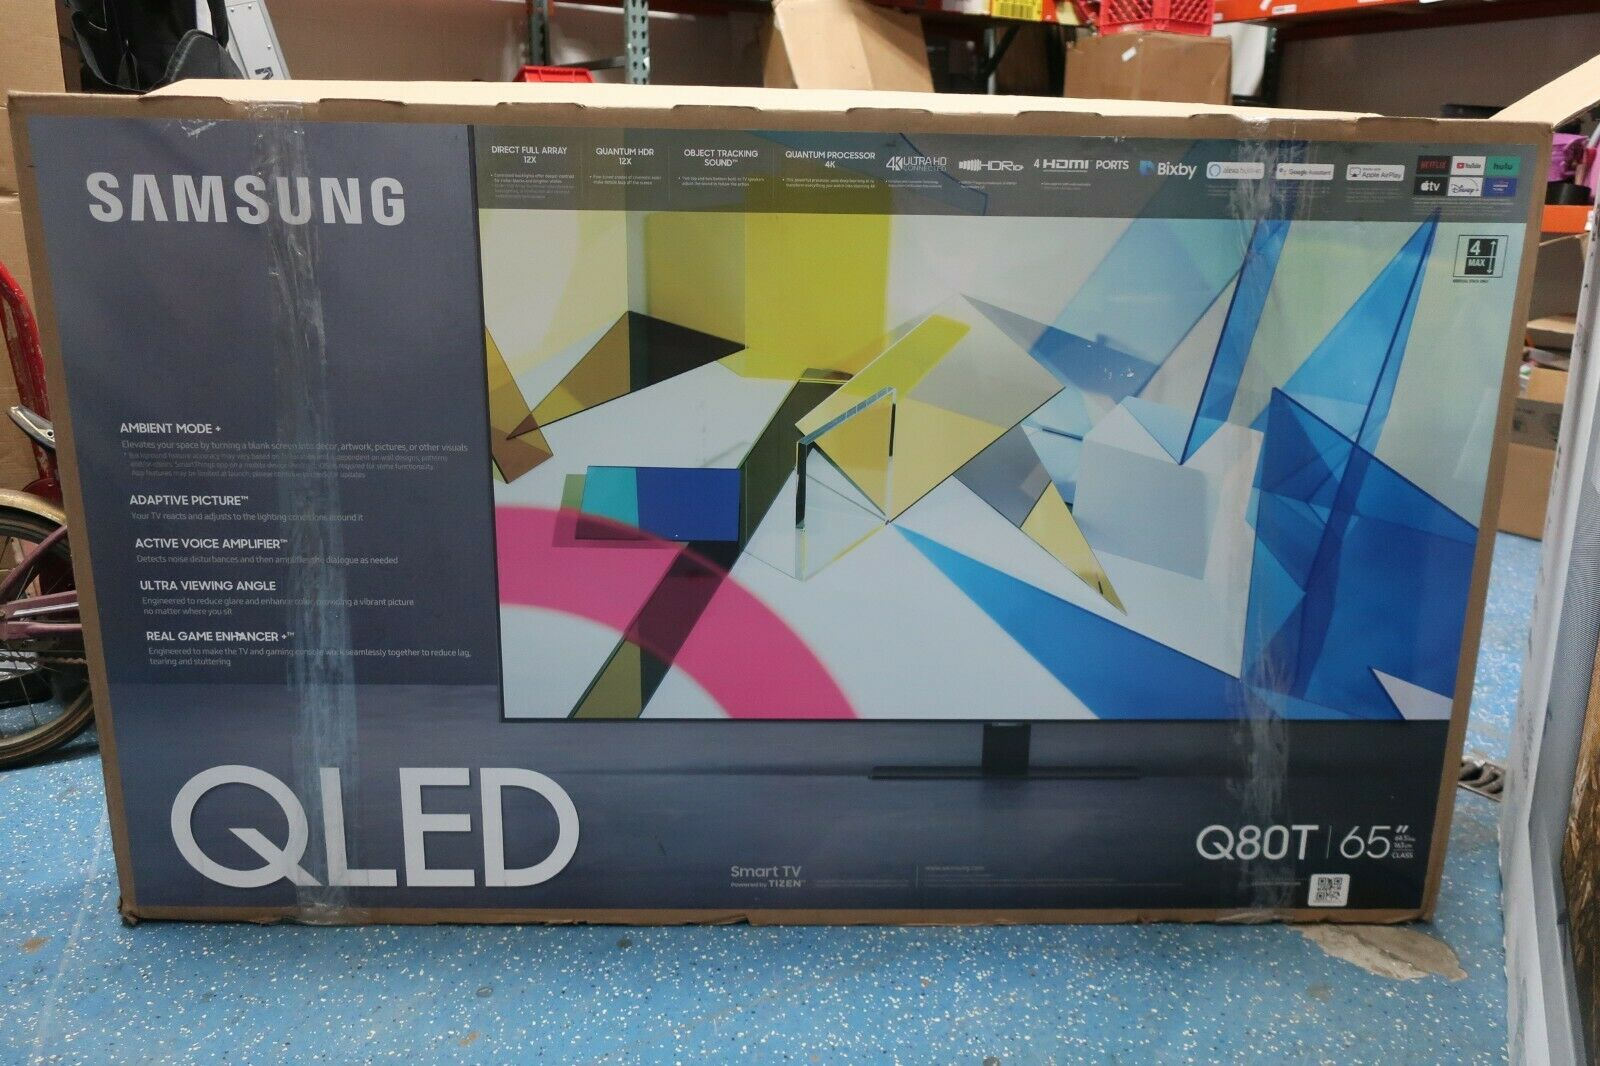 Samsung QN65Q80TAFXZA 65 Class Q80T QLED 4K UHD HDR Smart TV QN65Q80T -PICKUP**. Available Now for 999.99